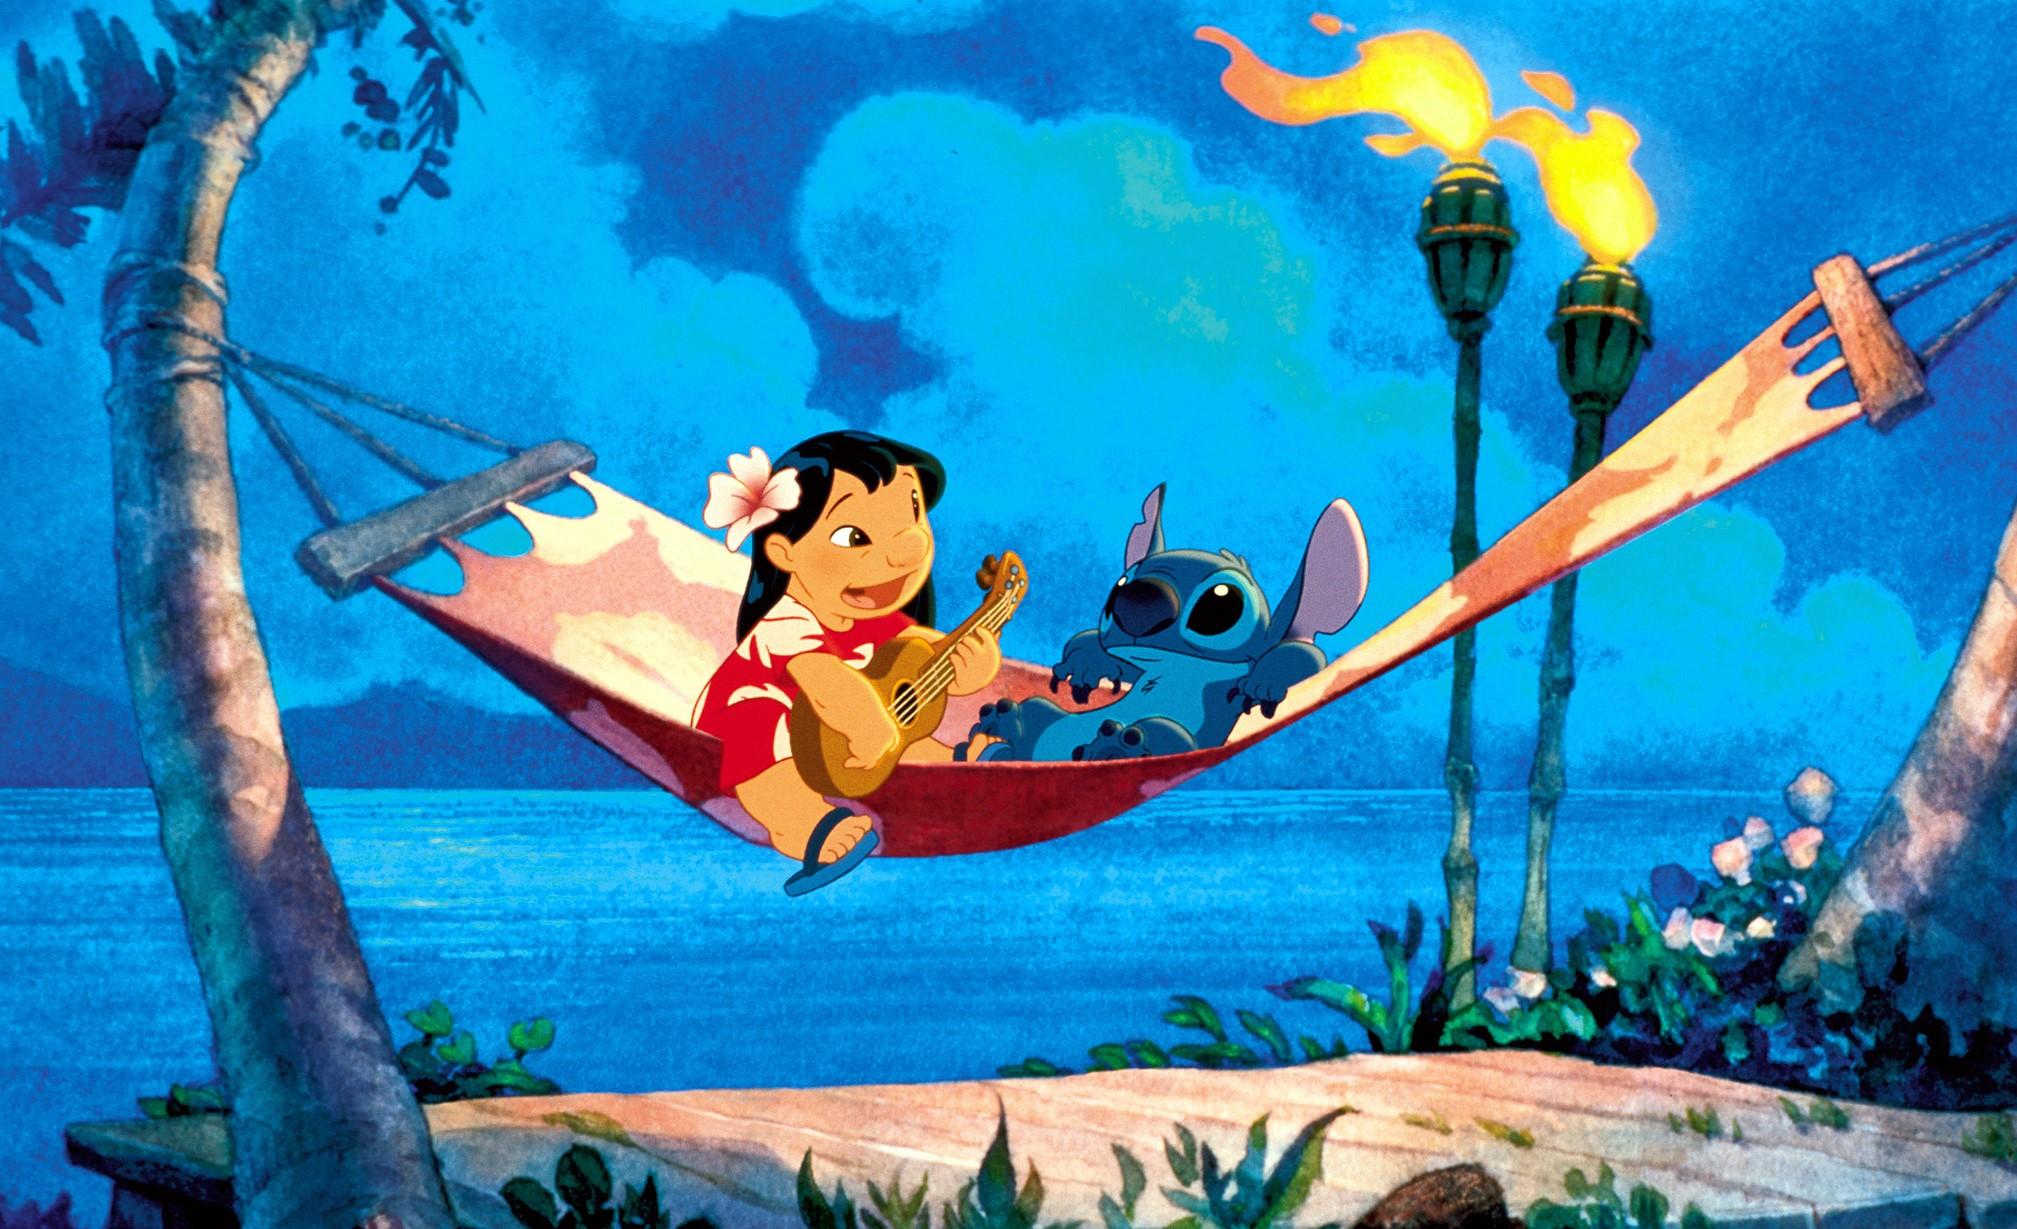 Lilo & Stitch – plats 21 på listan över de bästa Disneyfilmerna.